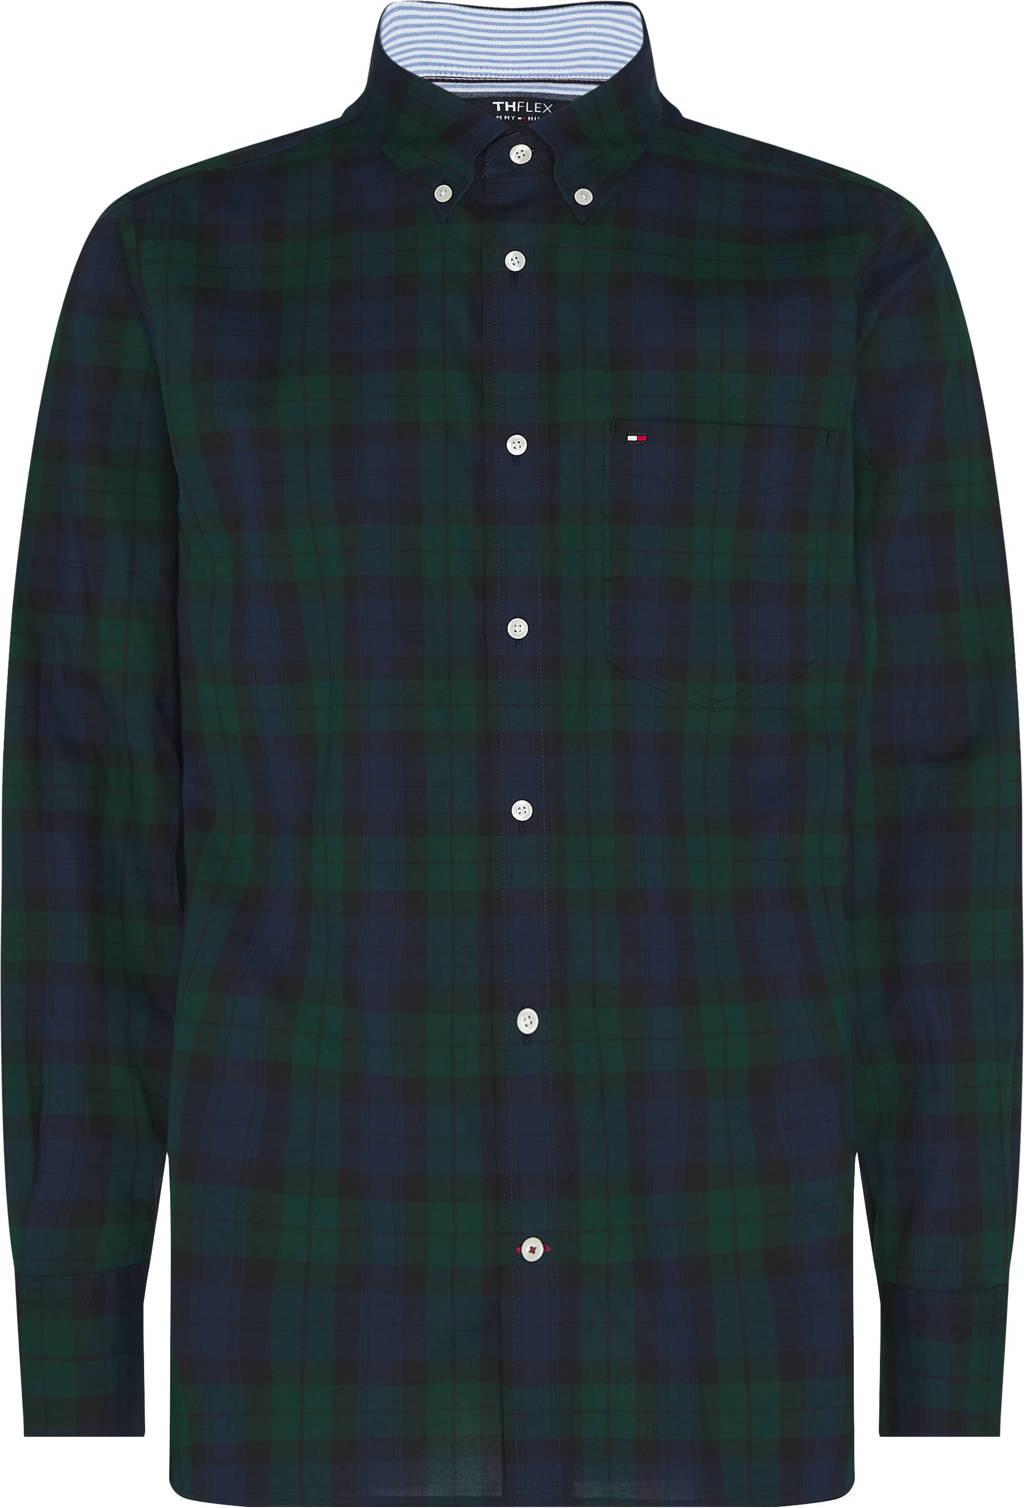 Tommy Hilfiger geruit regular fit overhemd donkergroen, Donkergroen